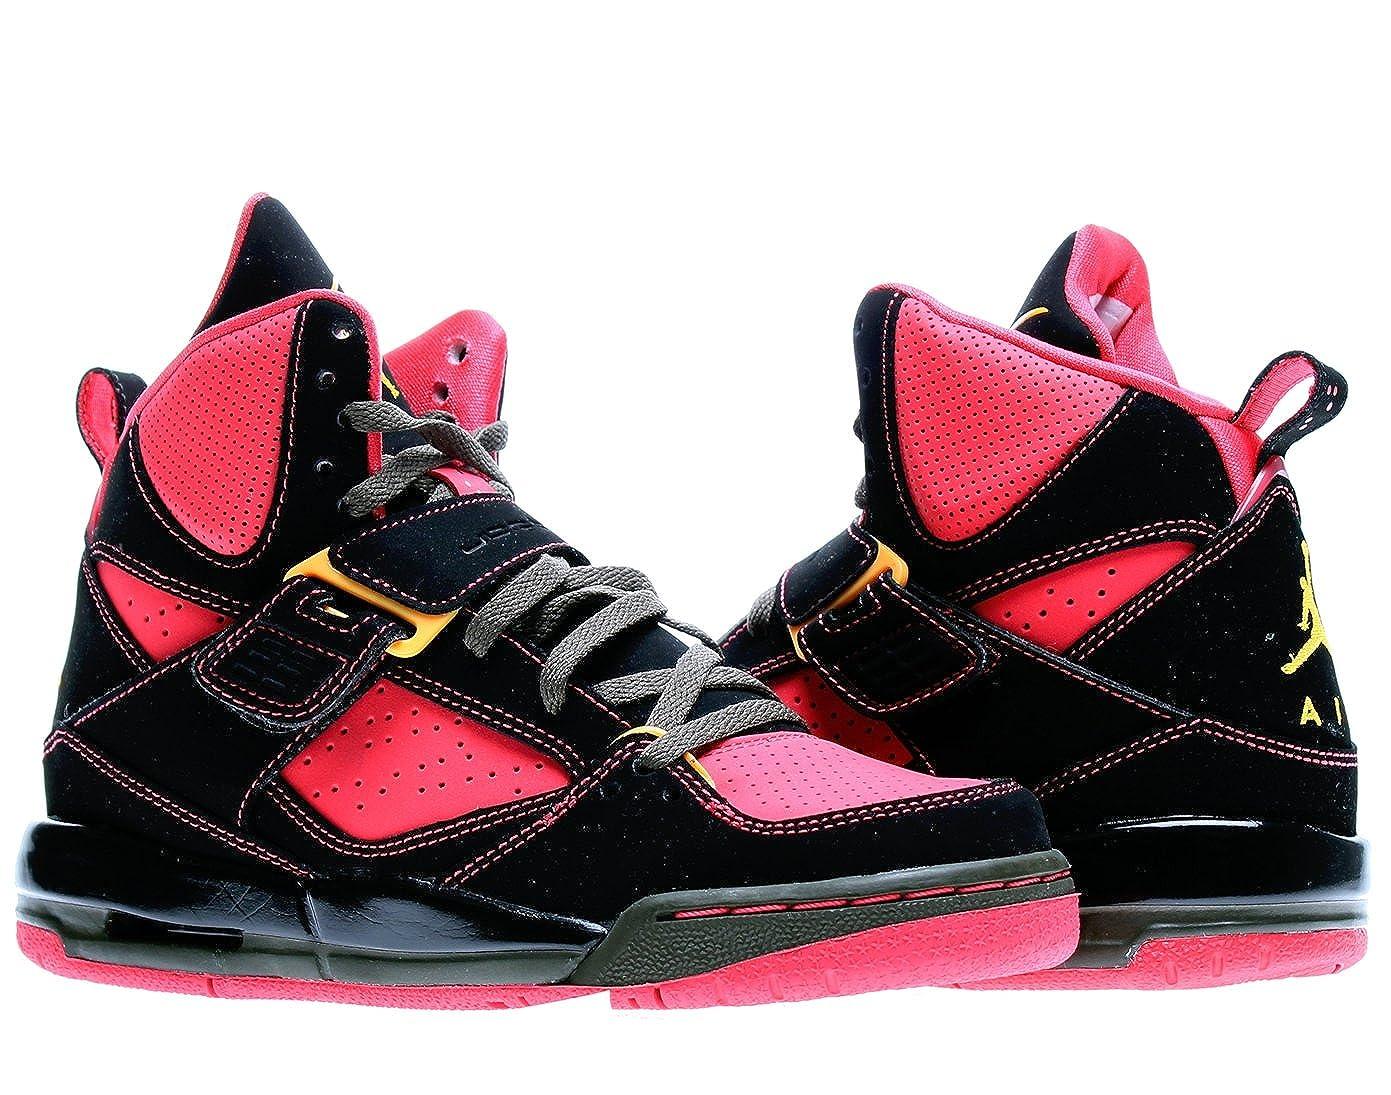 nouveau produit f79c8 2fa49 Amazon.com | Nike Air Jordan Flight 45 High (GS) Girls ...